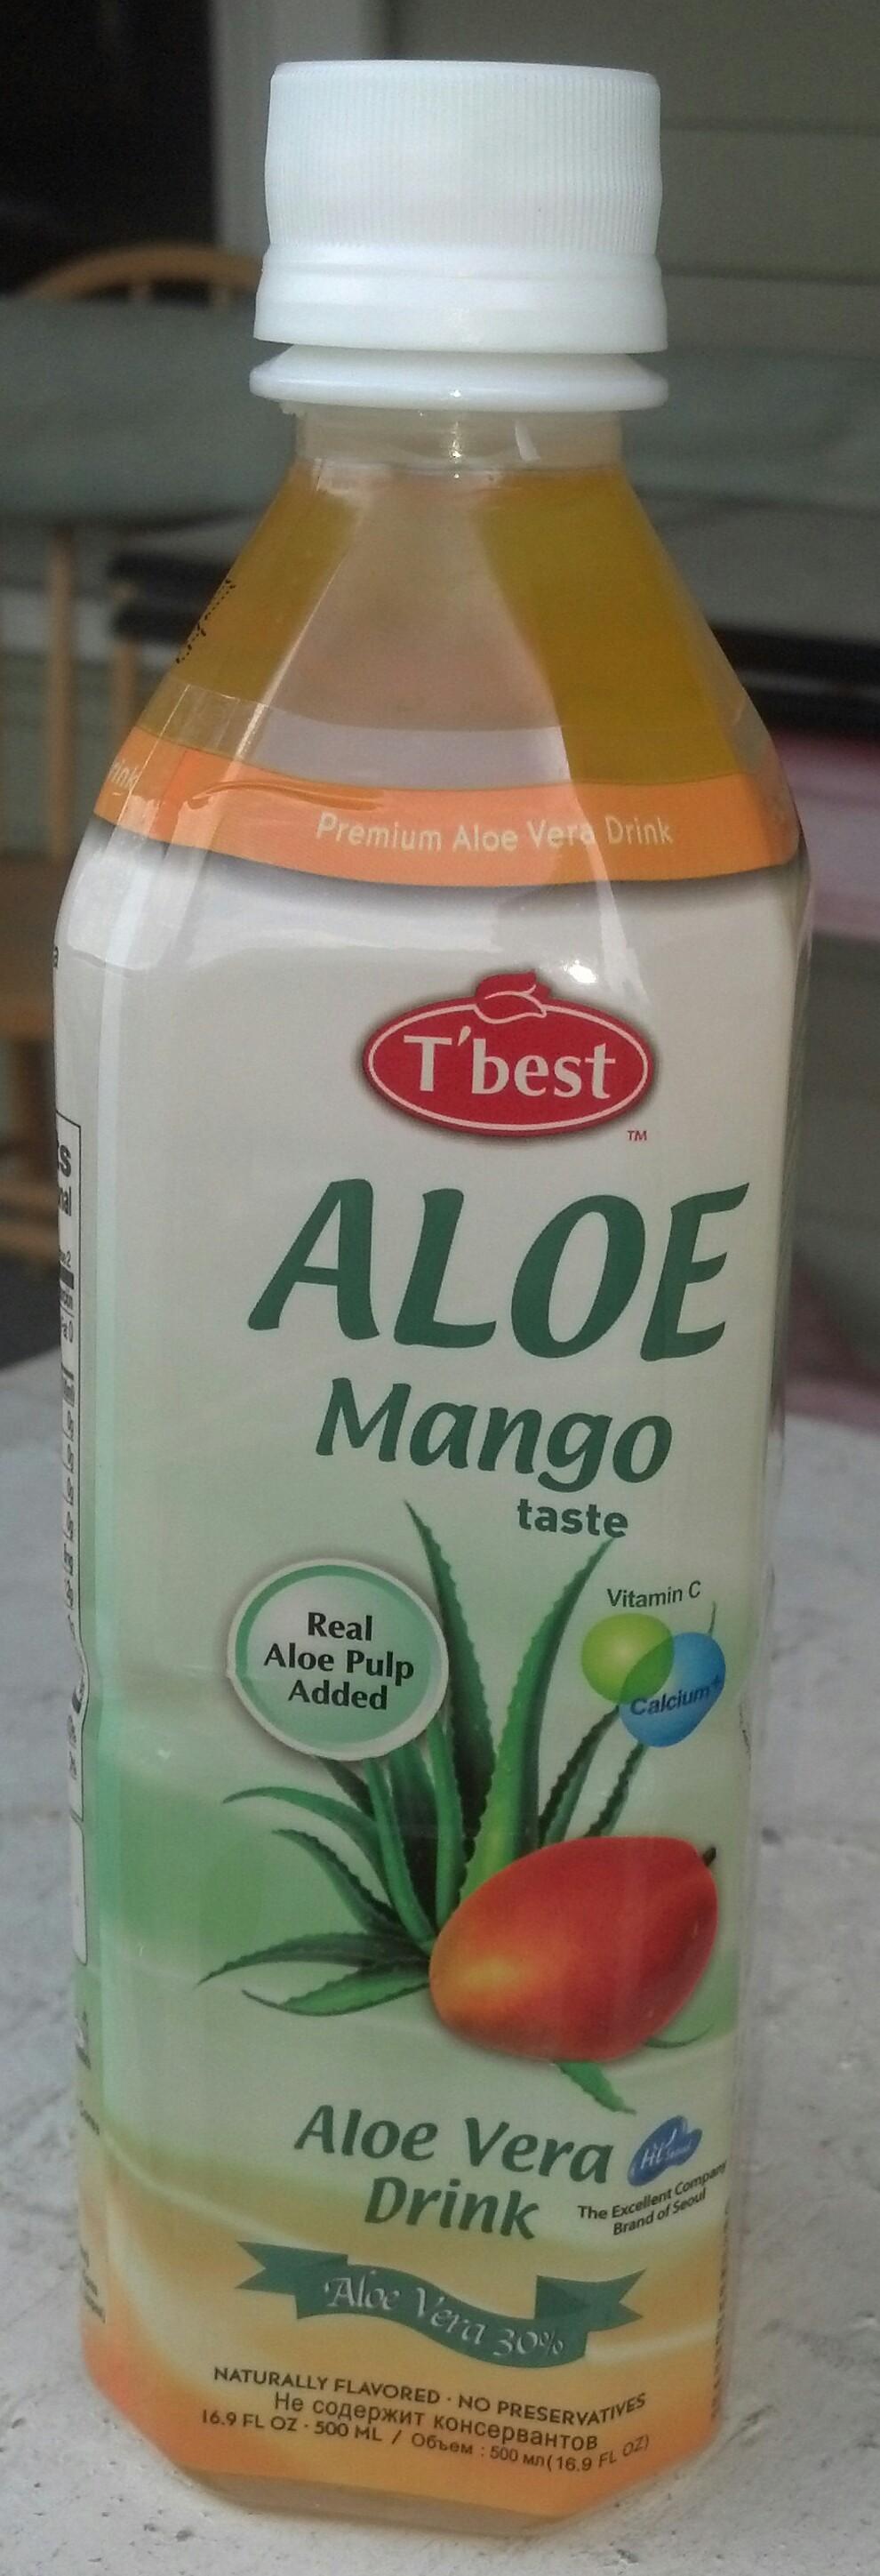 thirsty dudes t 39 best aloe vera drink mango. Black Bedroom Furniture Sets. Home Design Ideas